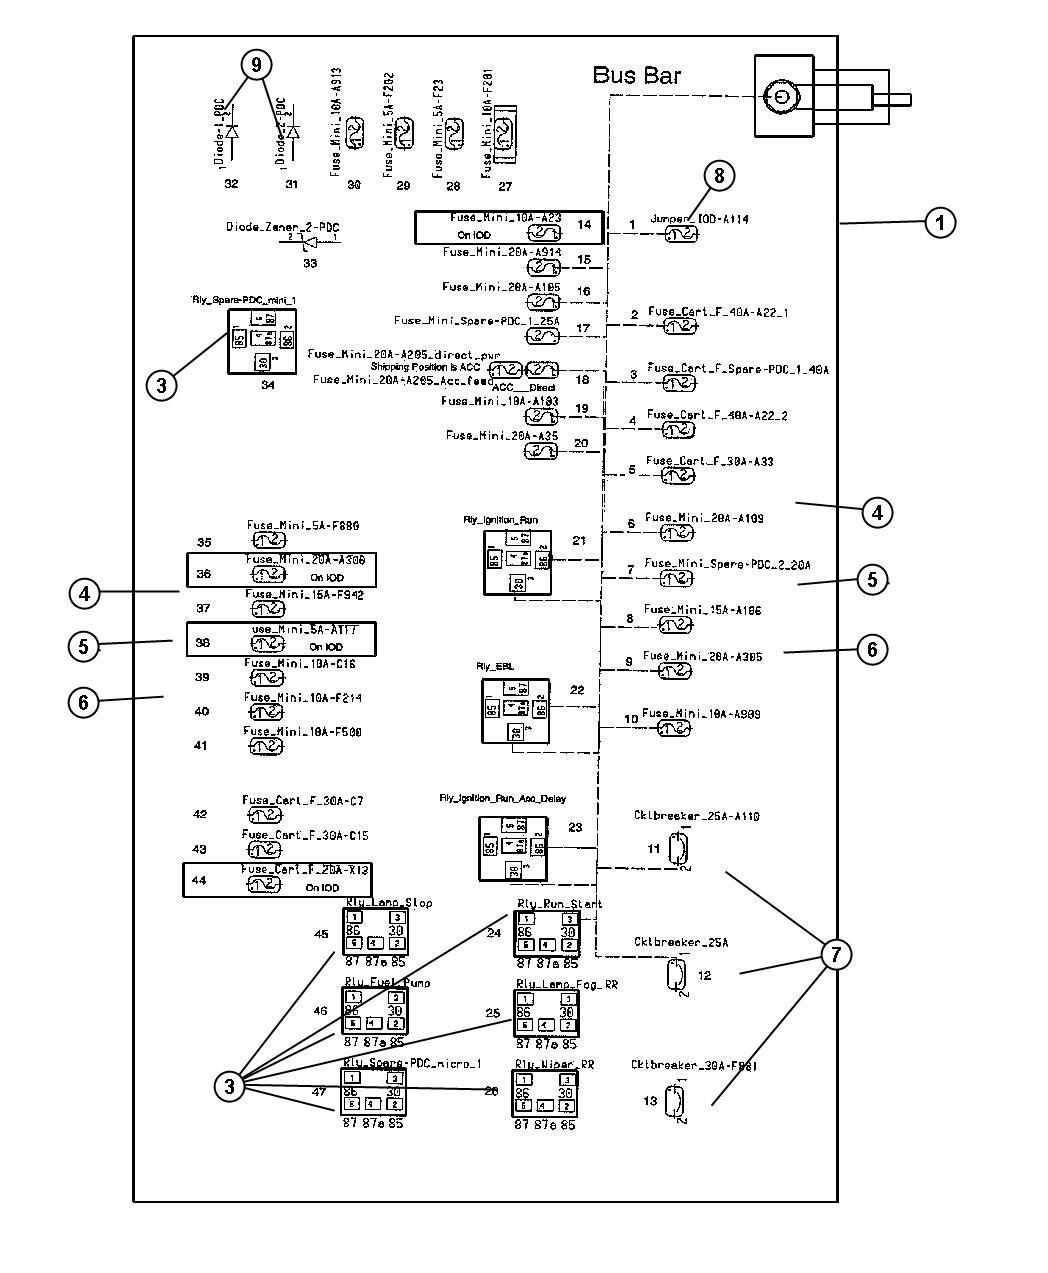 chrysler 300 fuse 60 amp iod fuse 05161423aa factory. Black Bedroom Furniture Sets. Home Design Ideas